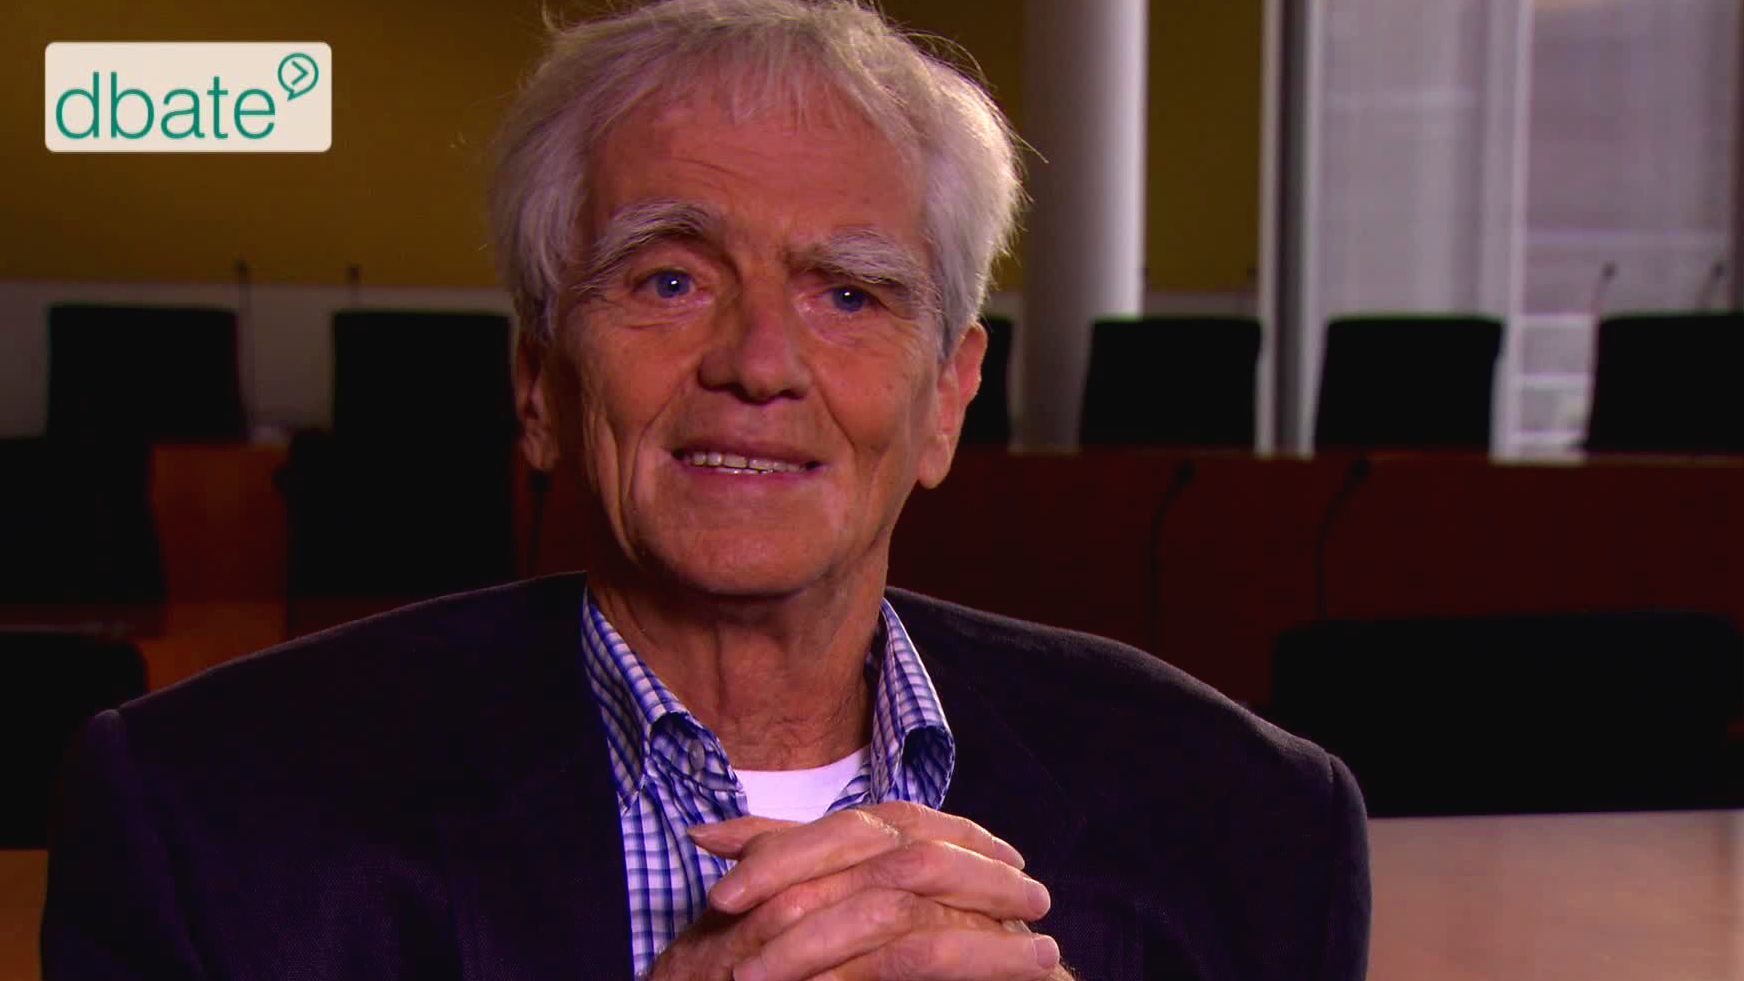 Grünen-Politiker Hans-Christian Ströbele im Interview mit Stephan Lamby.